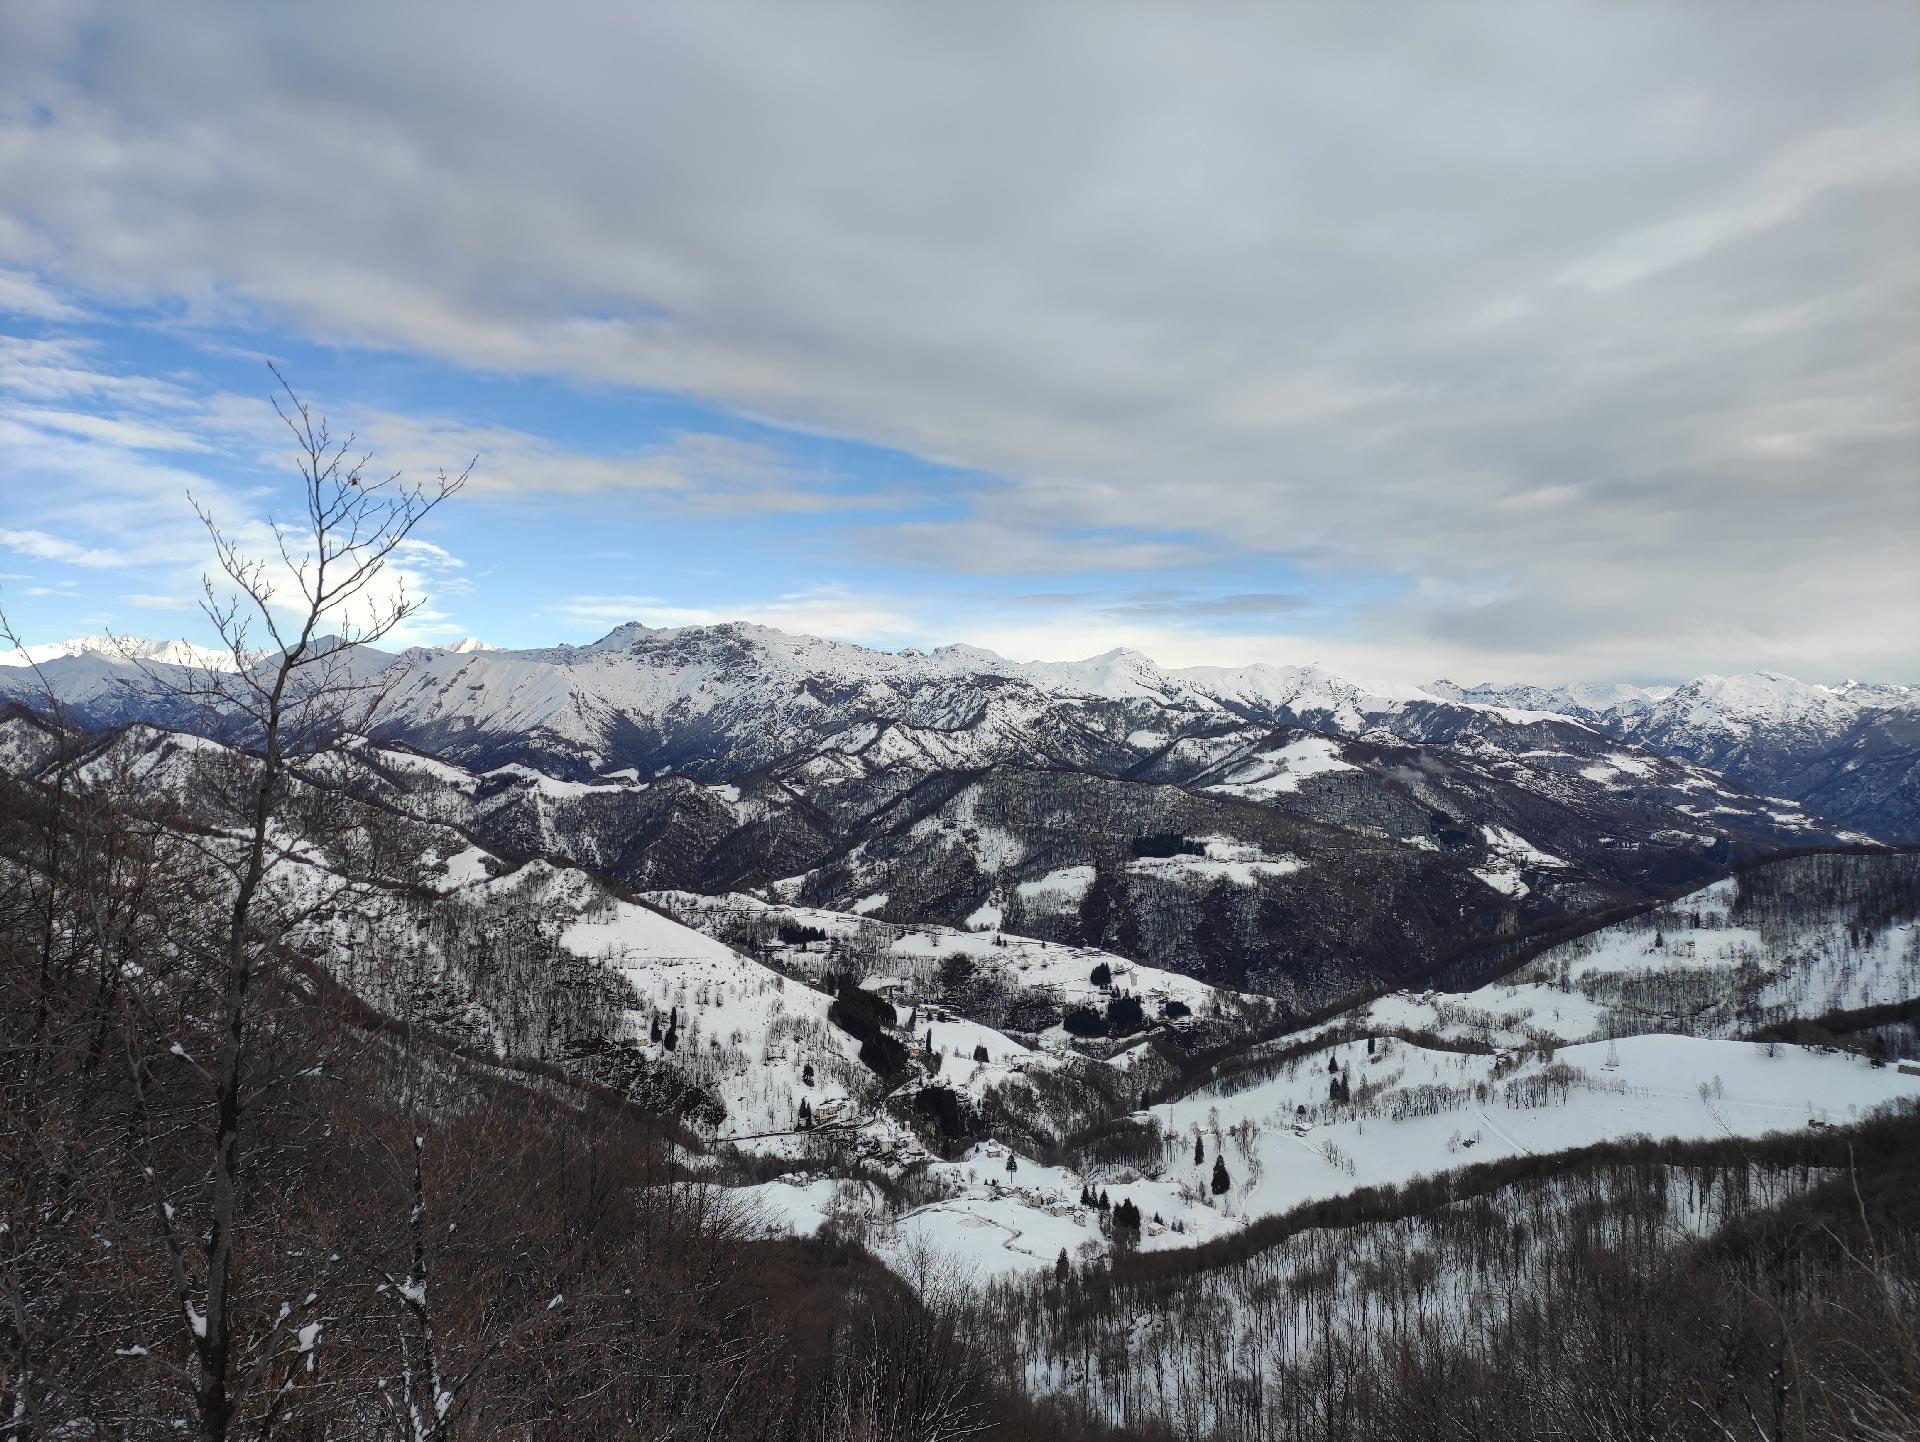 Trekking invernali in Valsassina: panorama sulle montagne Valsassinesi